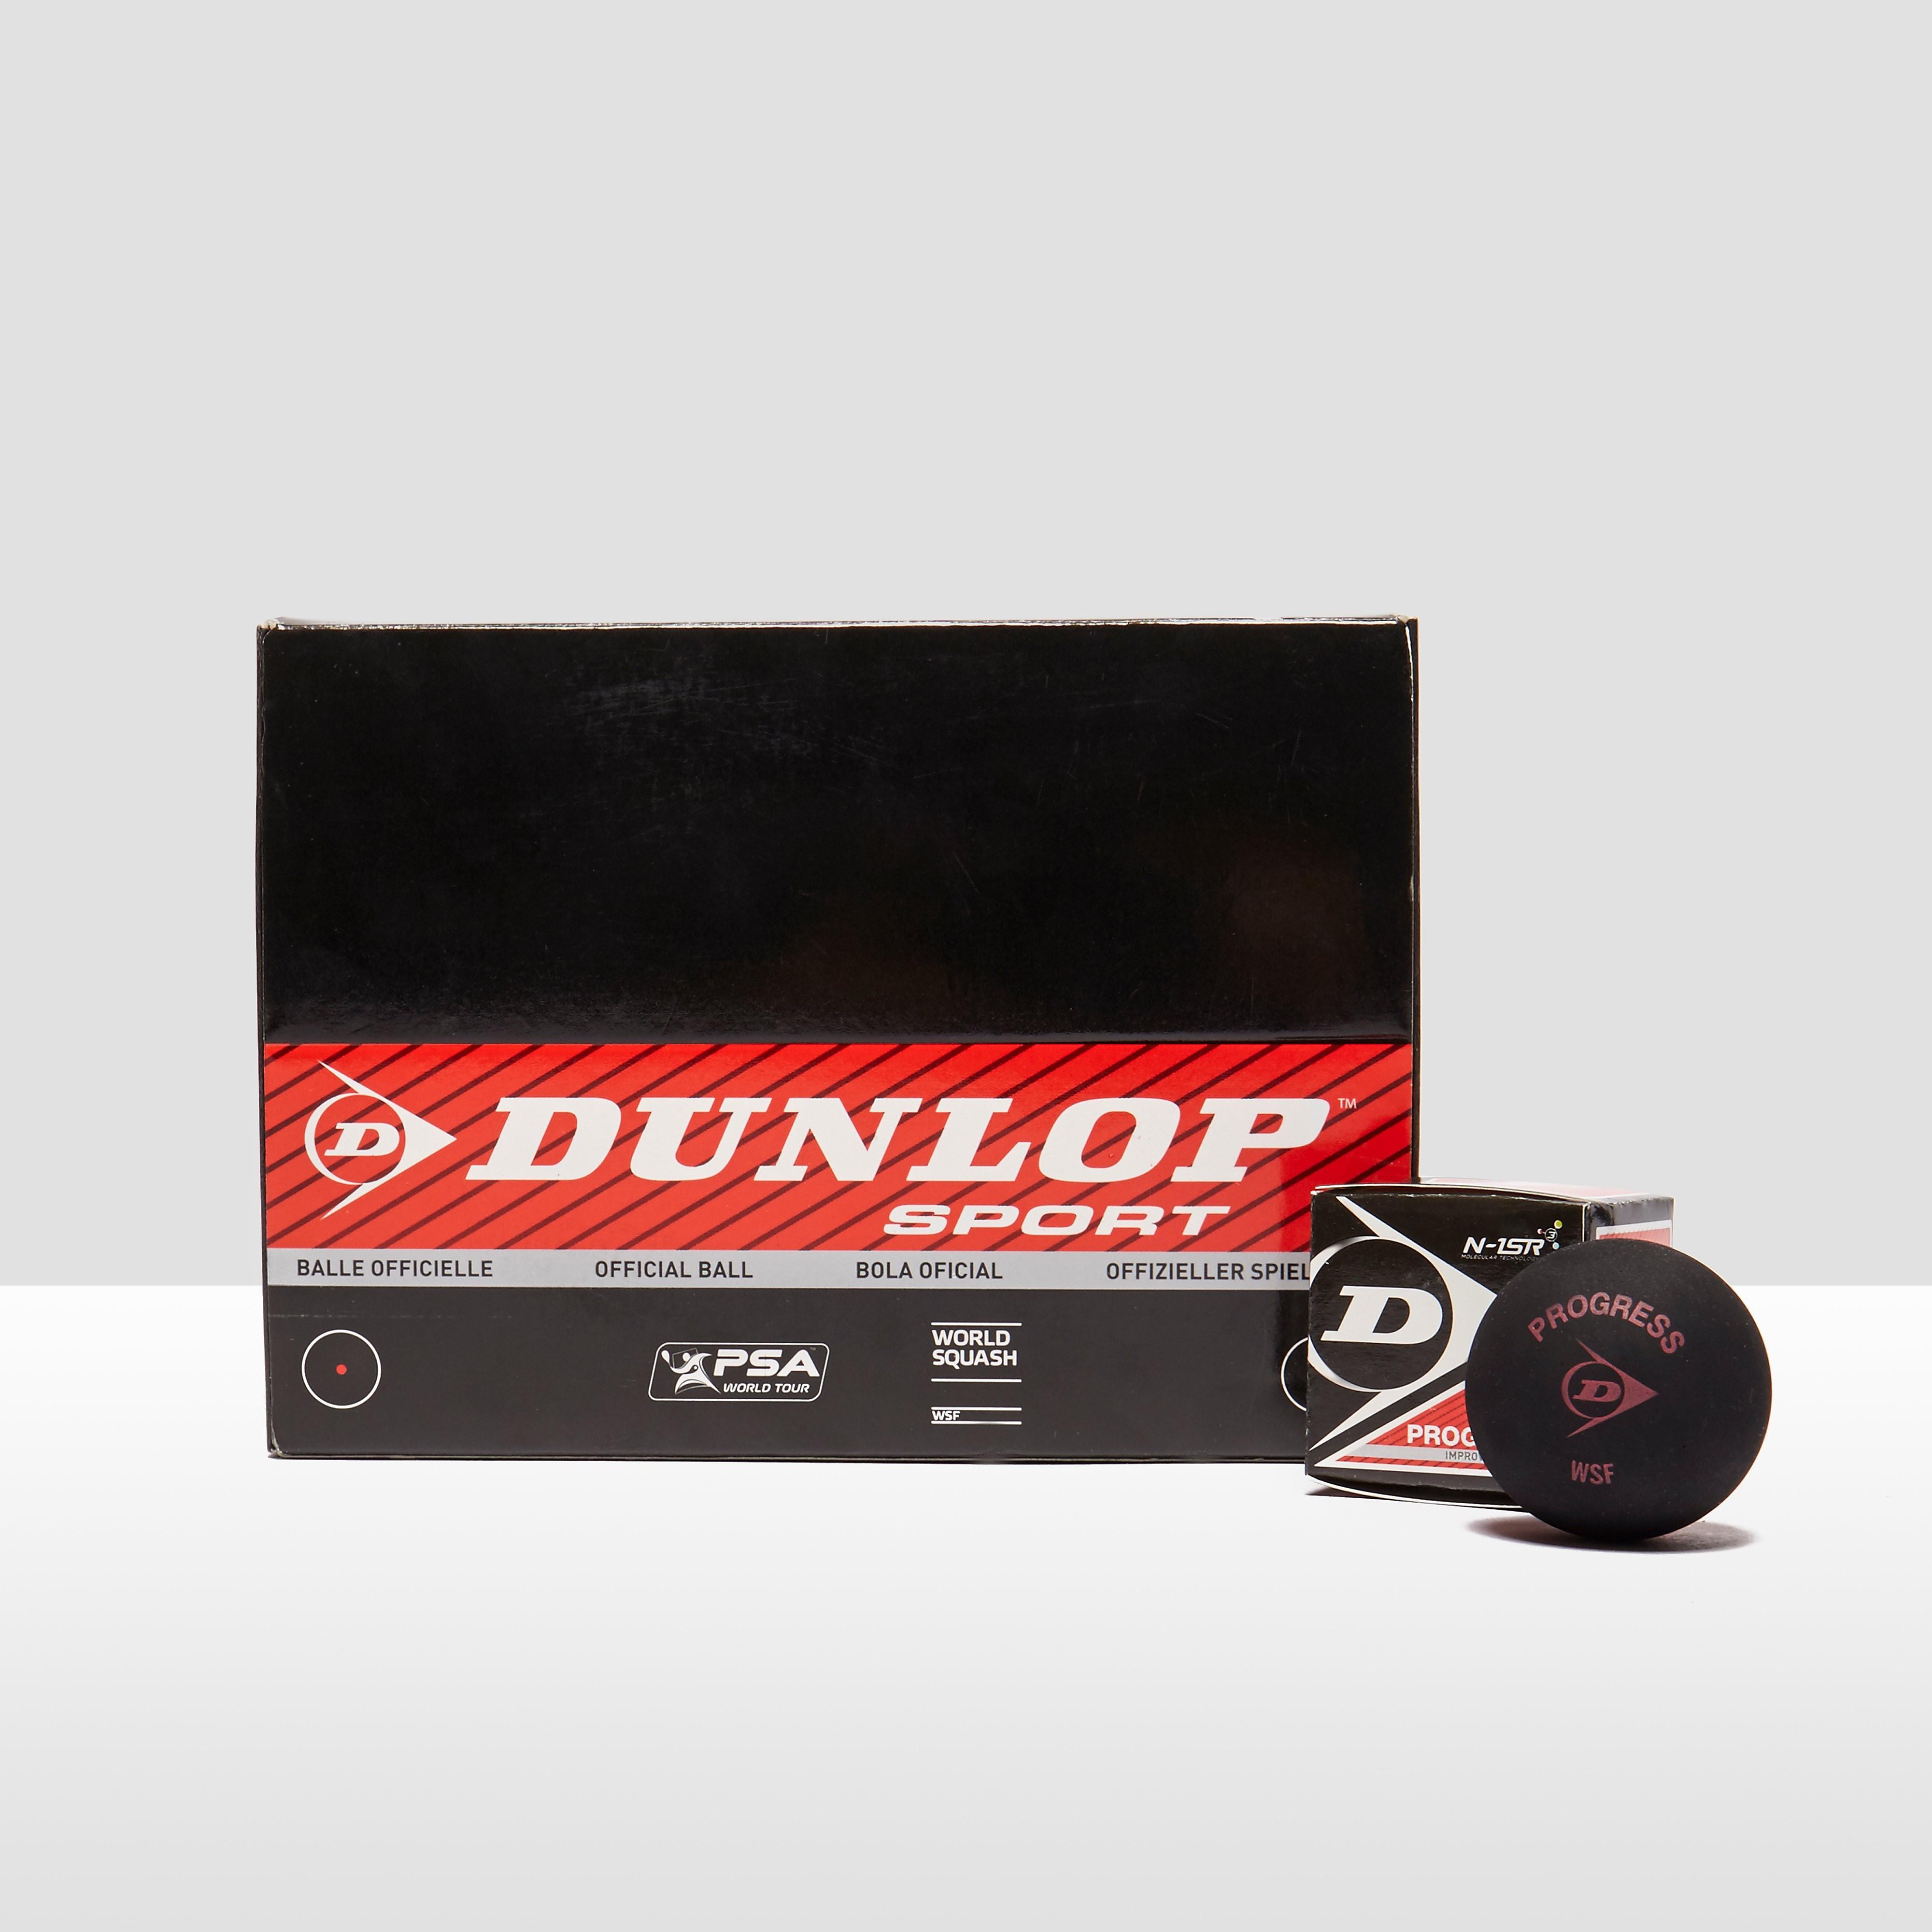 Dunlop 12 Pack Squash Balls